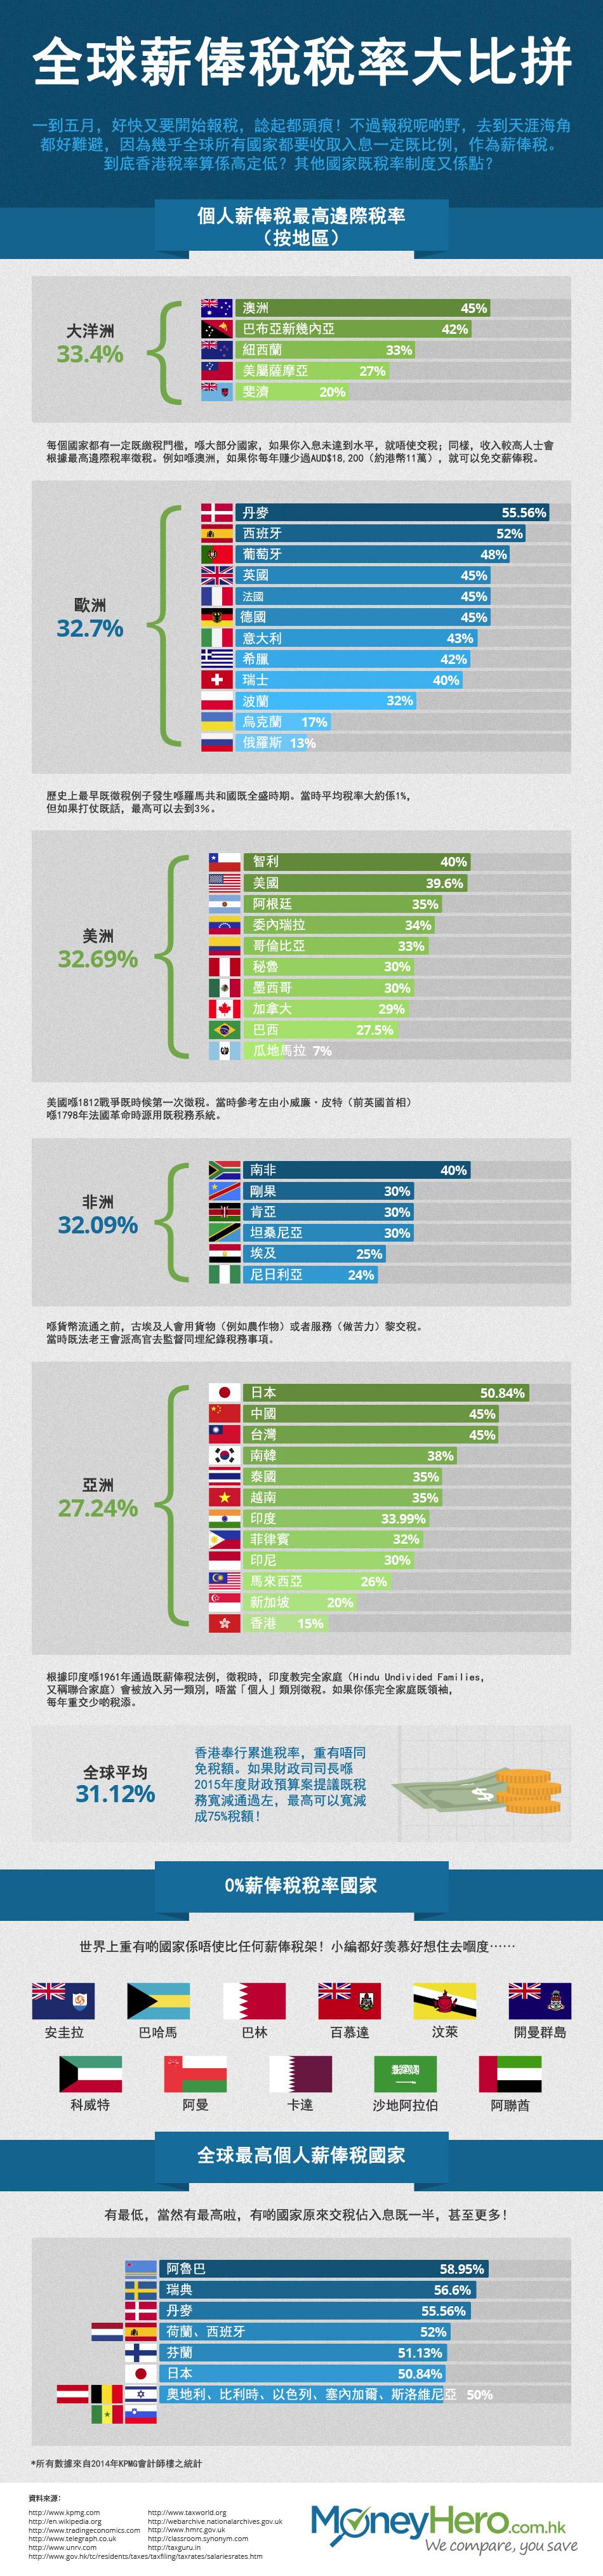 IG_HK-ZH_TaxComparison